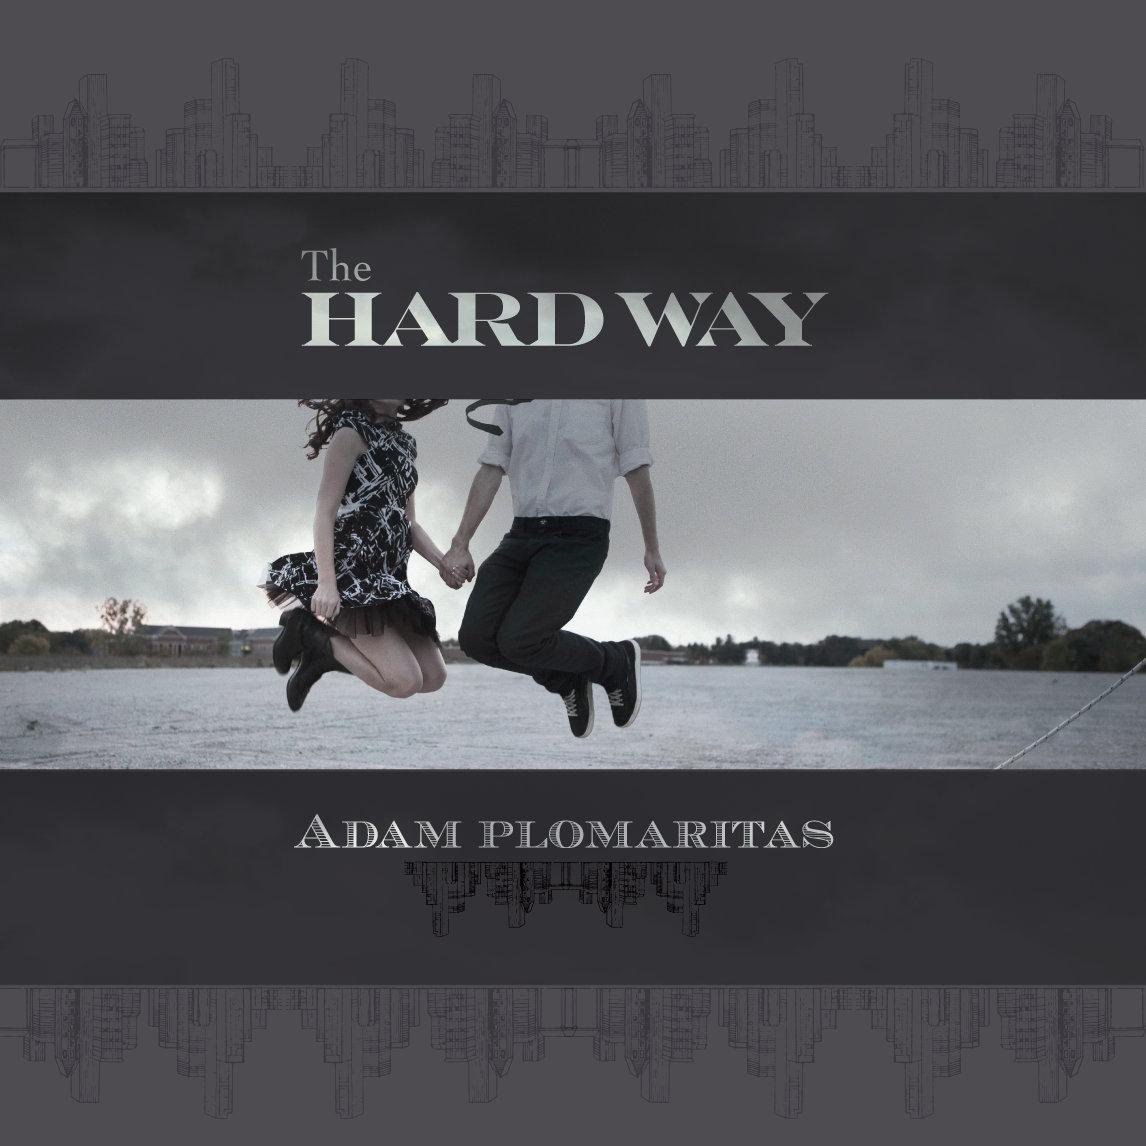 Adam Plomaritas: The Hardway